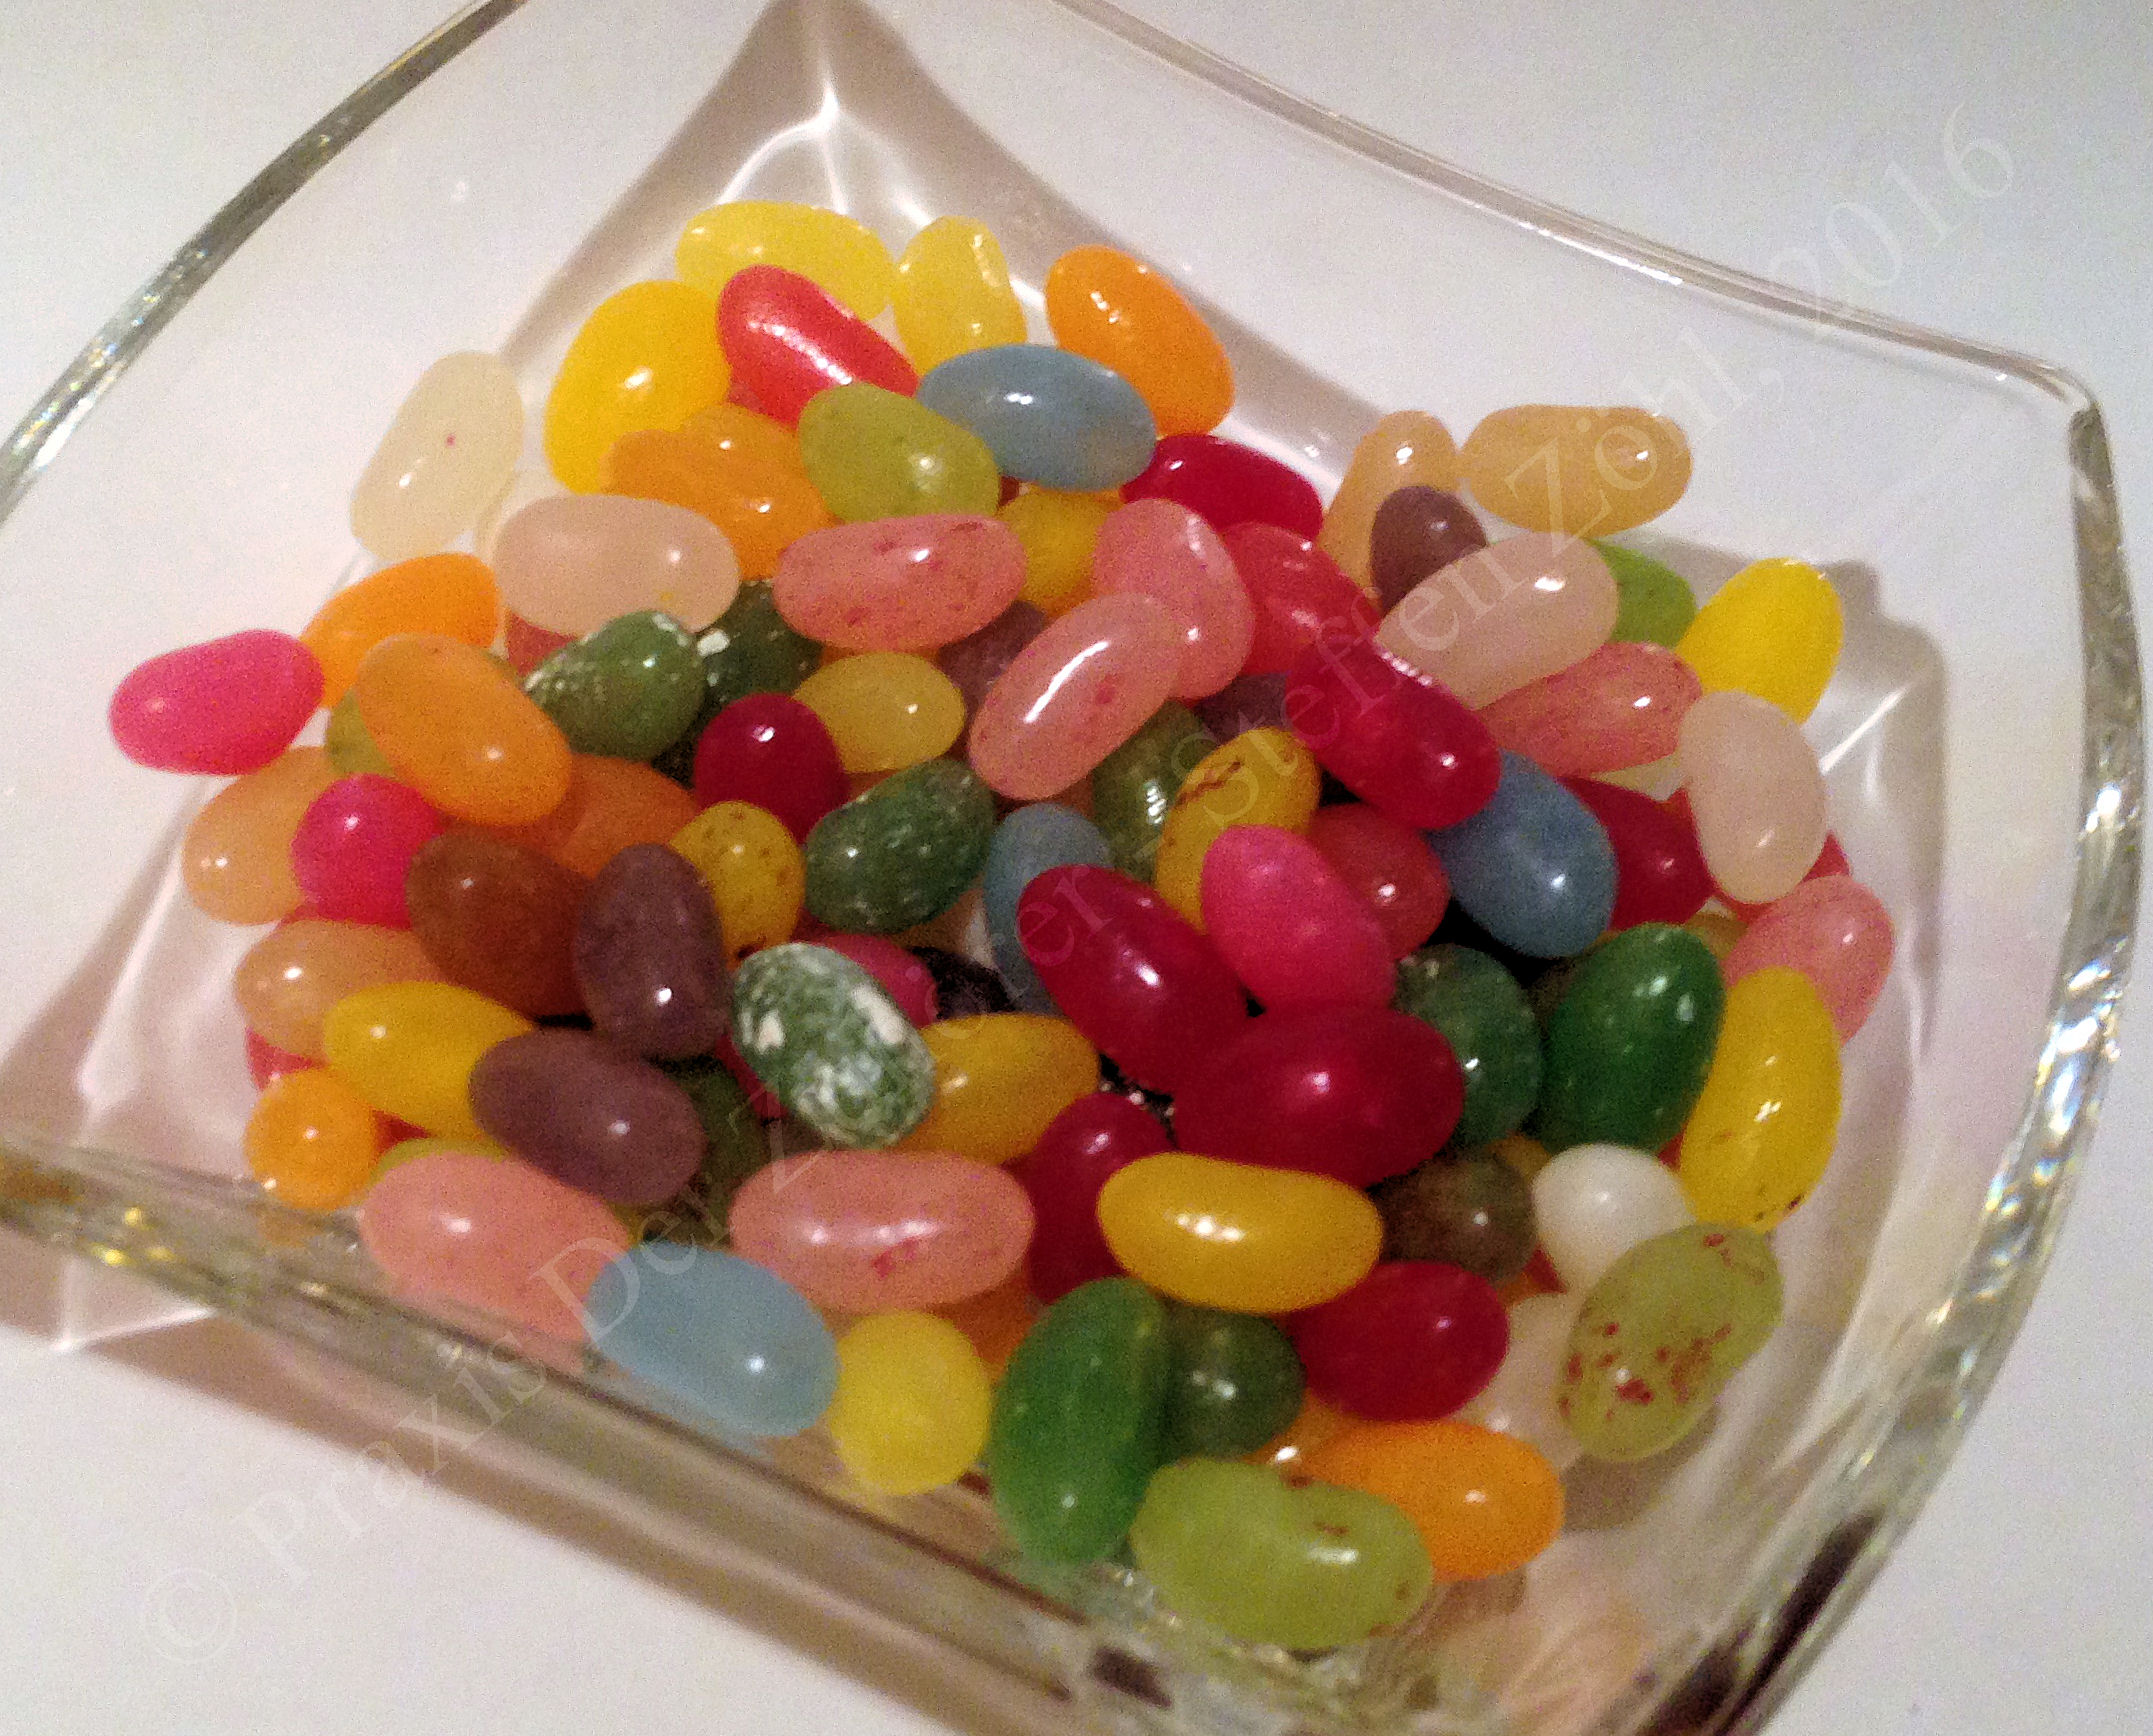 jelly beans SinnSationsGeschichten © Praxis Der Zuhörer - Steffen ZöhlCharlottenburg